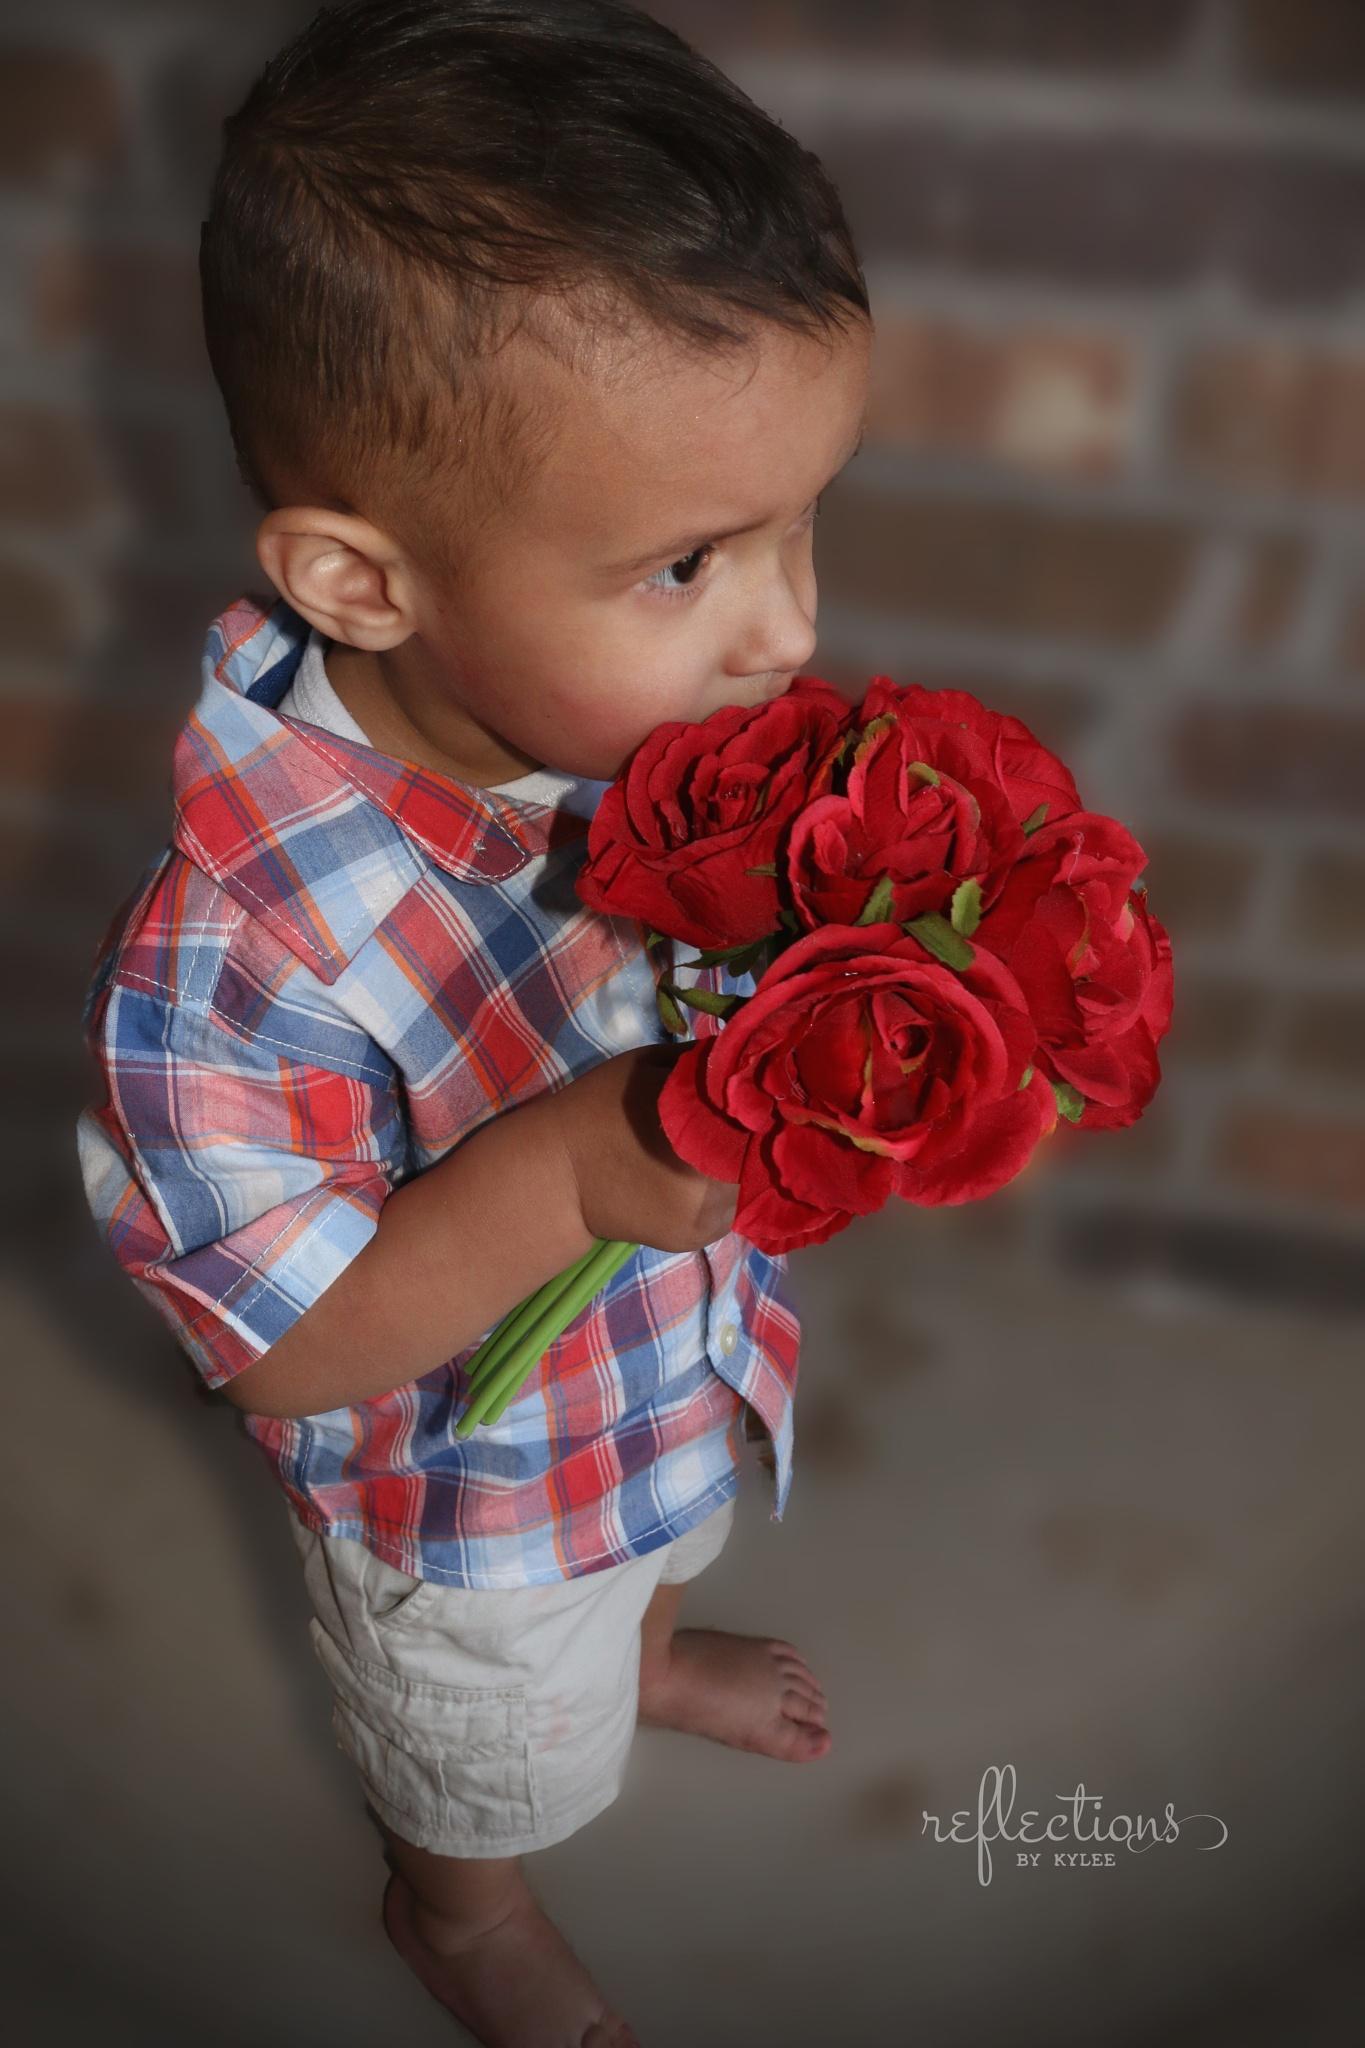 Be My Valentine by kjwoods79